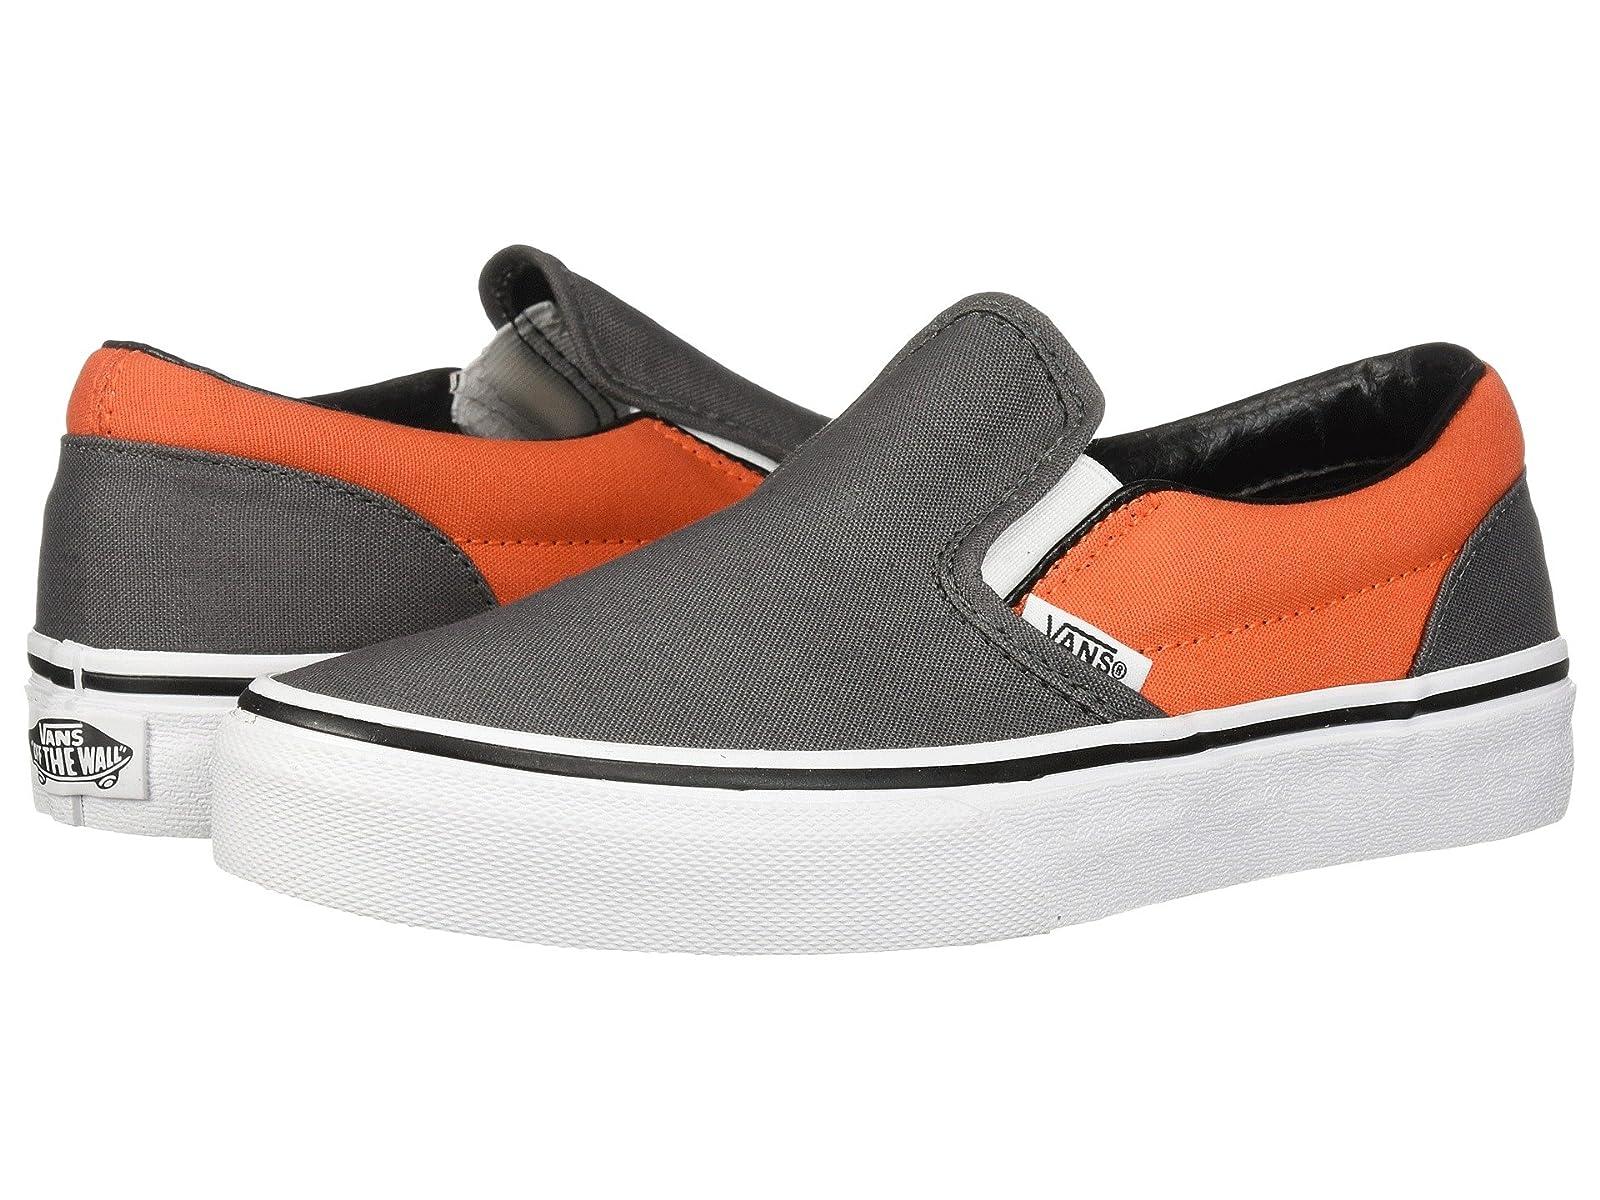 Vans Kids Classic Slip-On (Little Kid/Big Kid)Atmospheric grades have affordable shoes